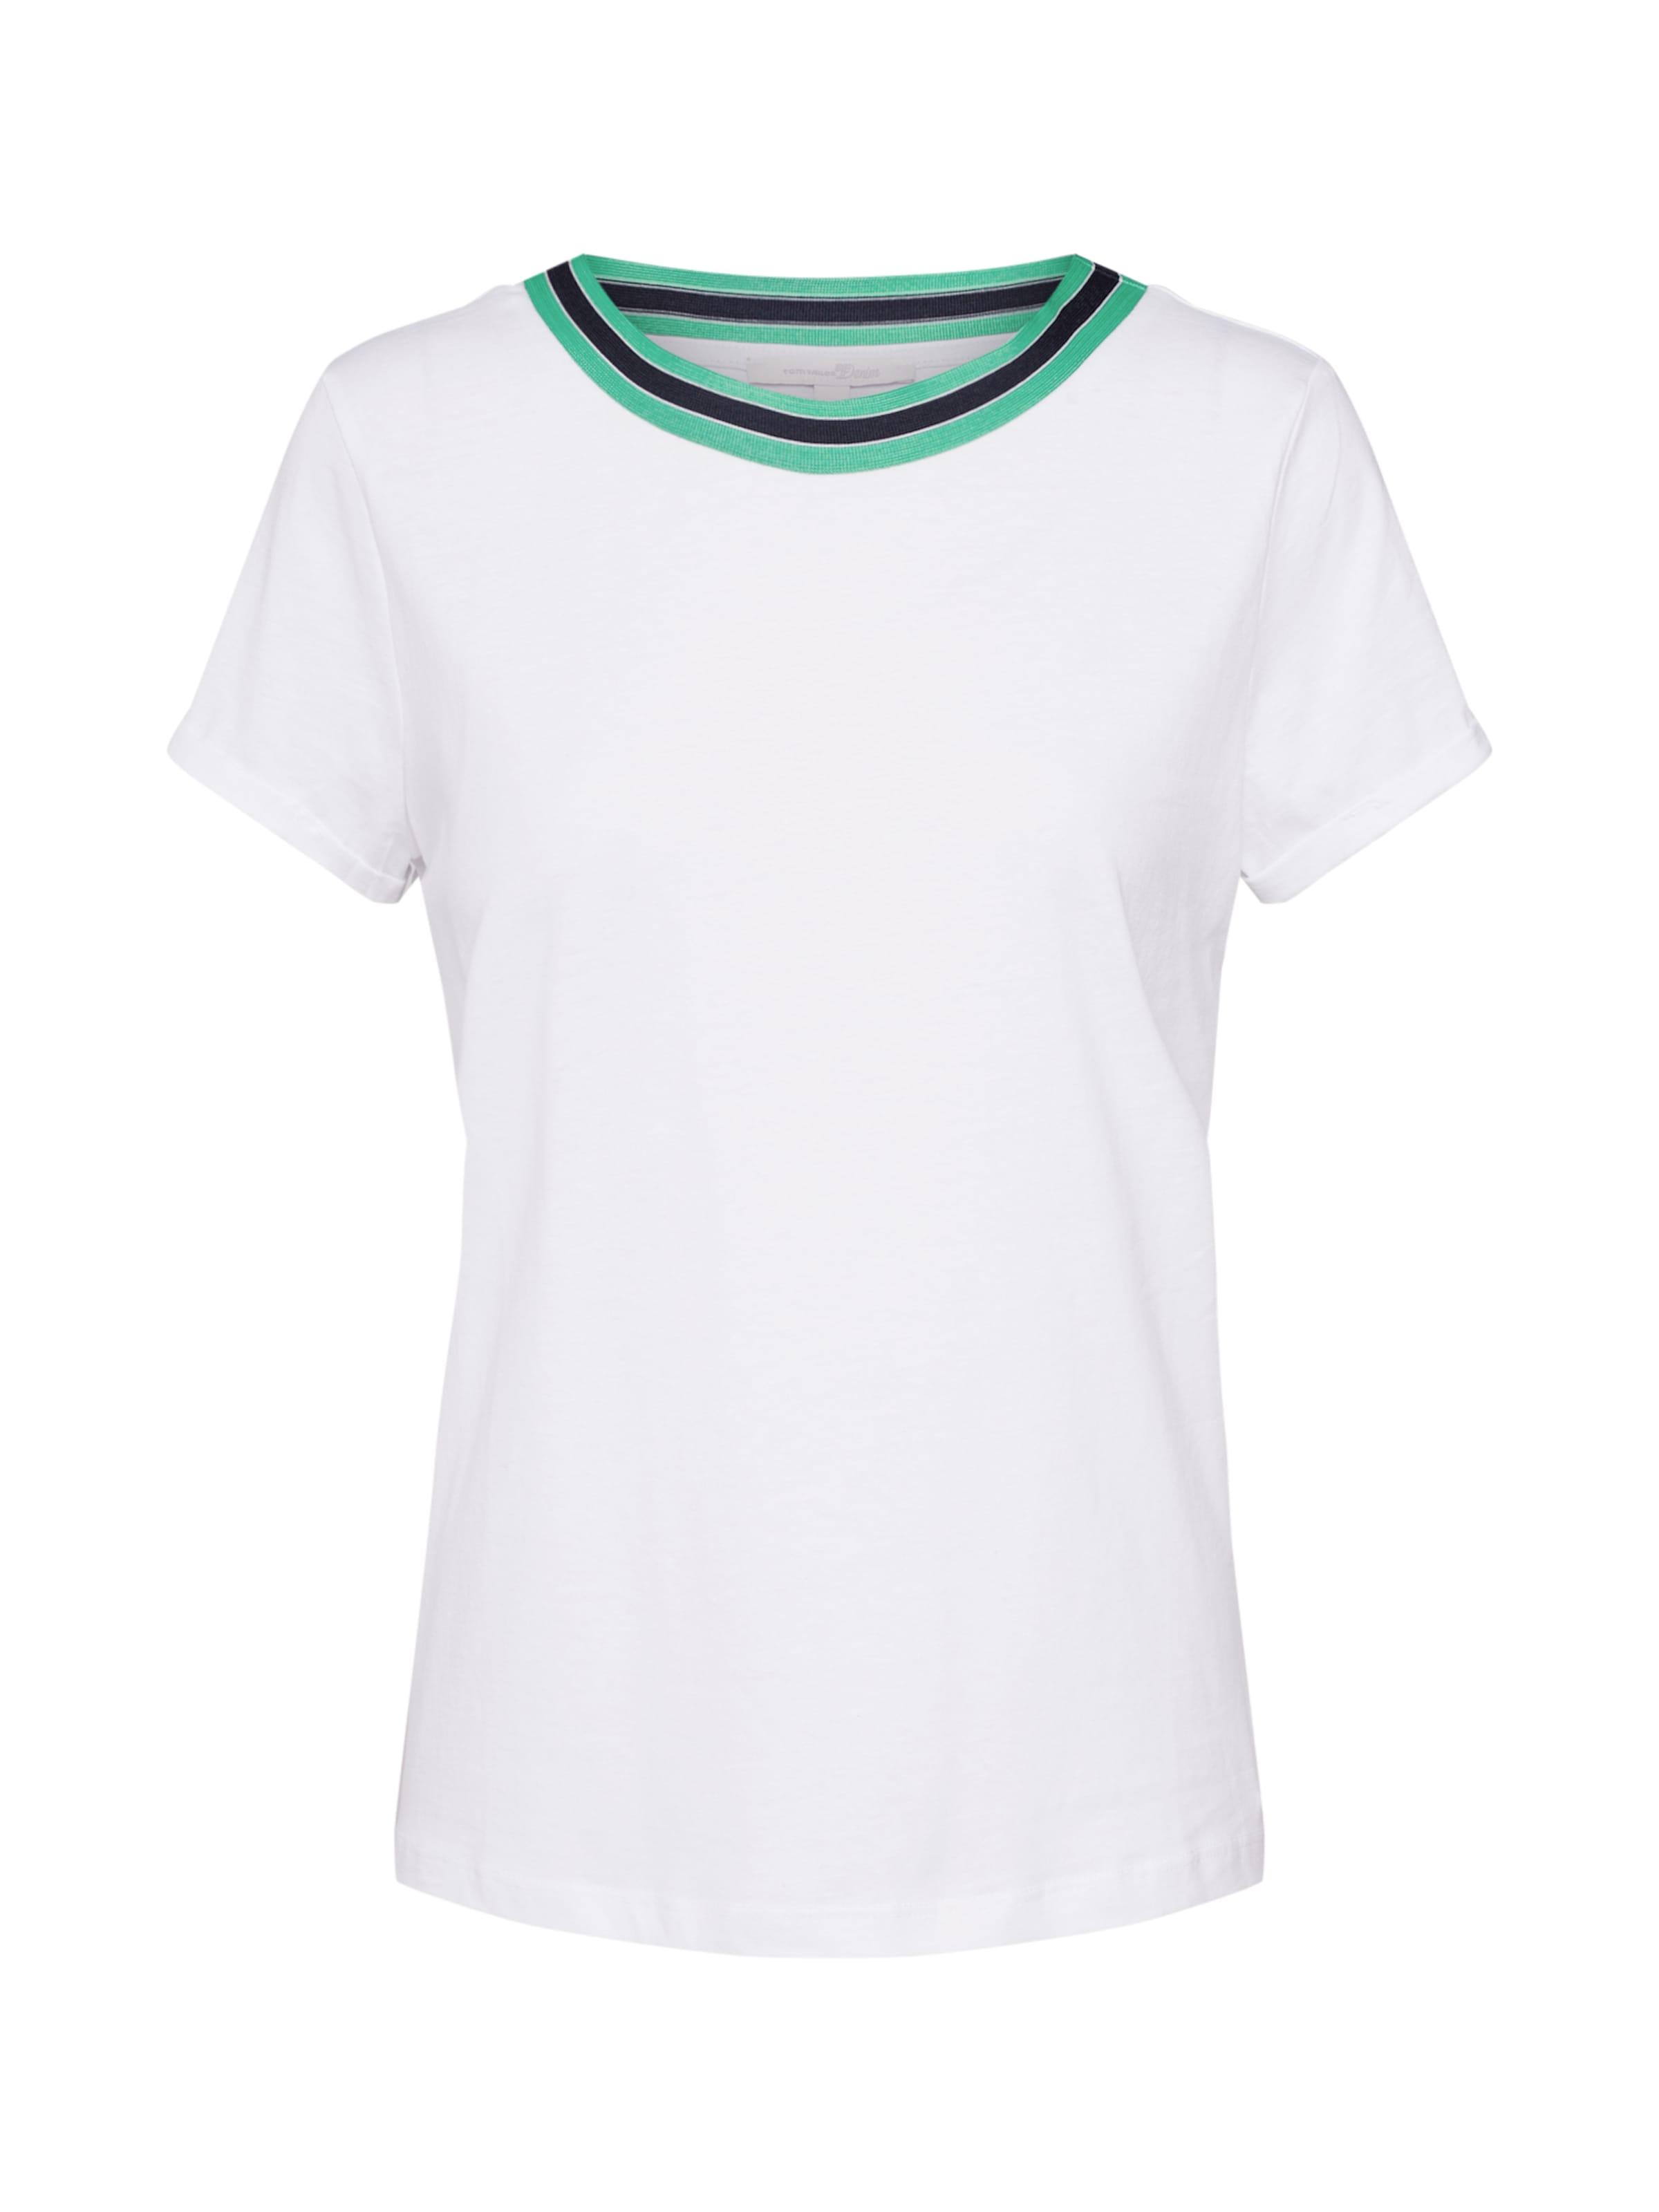 Tailor Denim Tom Shirt DunkelgrünWeiß In fgbY7yI6mv